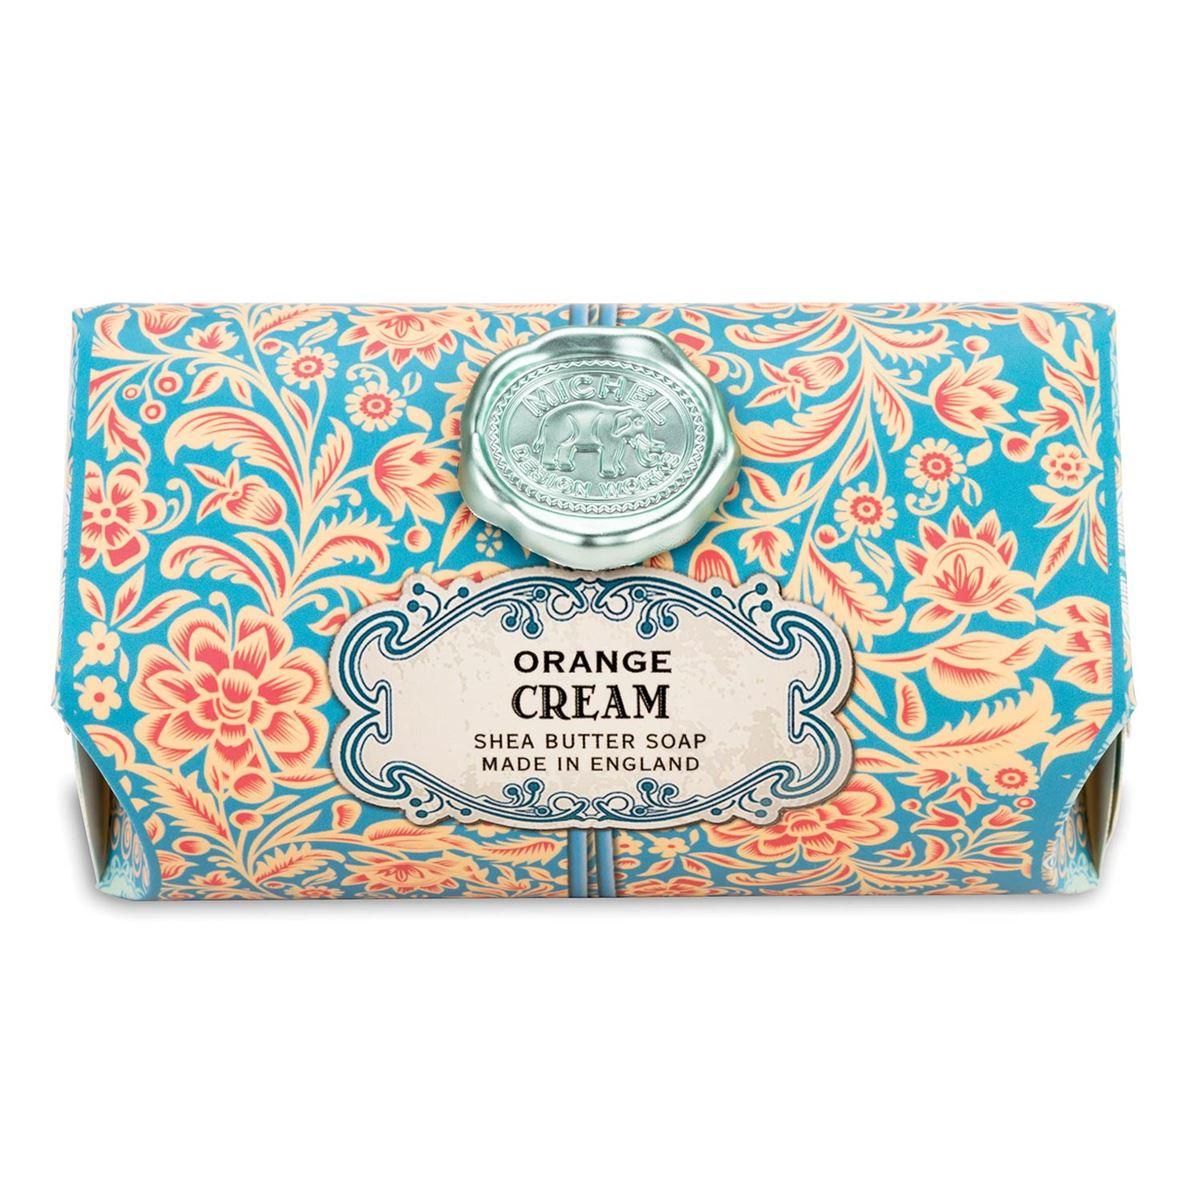 Michel Design Works Large Bath Soap Bars Orange Cream